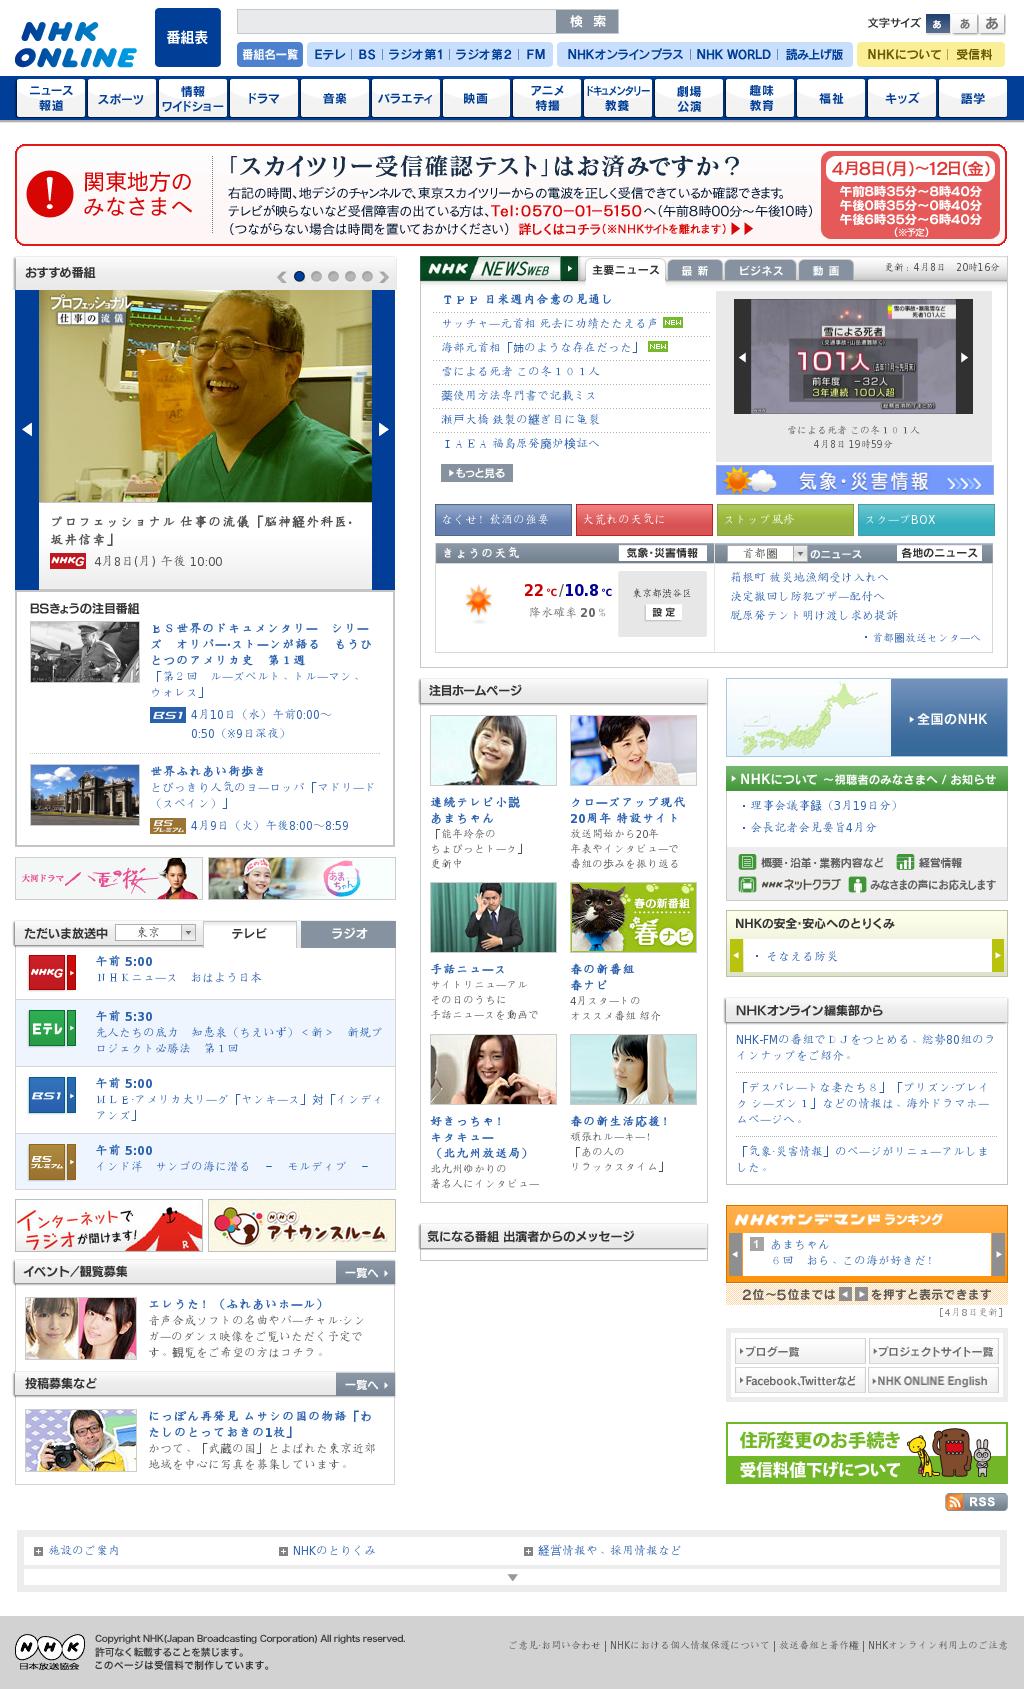 NHK Online at Monday April 8, 2013, 8:31 p.m. UTC